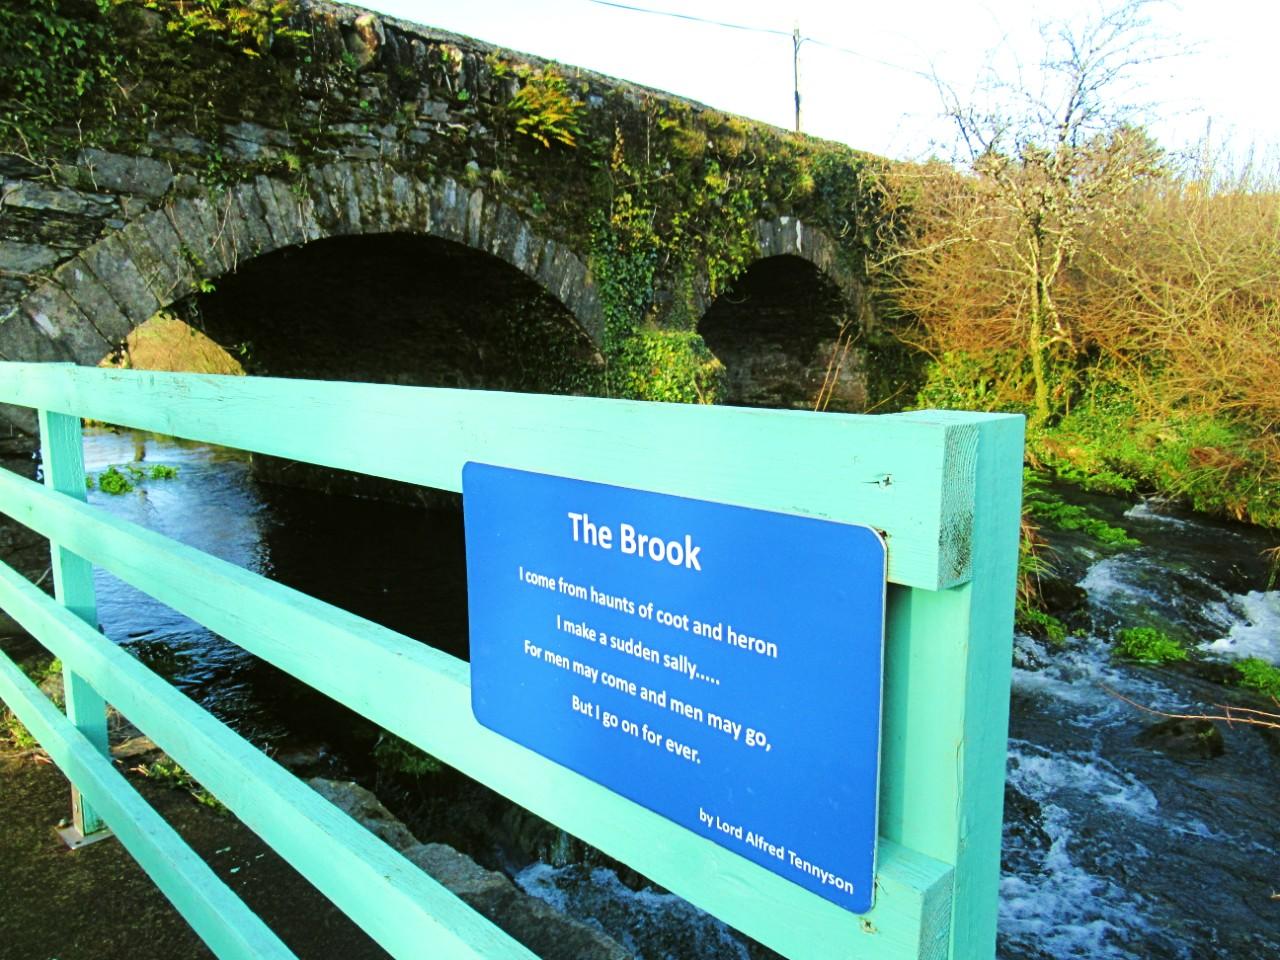 The Brook poem by Tennyson at the start of Deelish Cascades walk